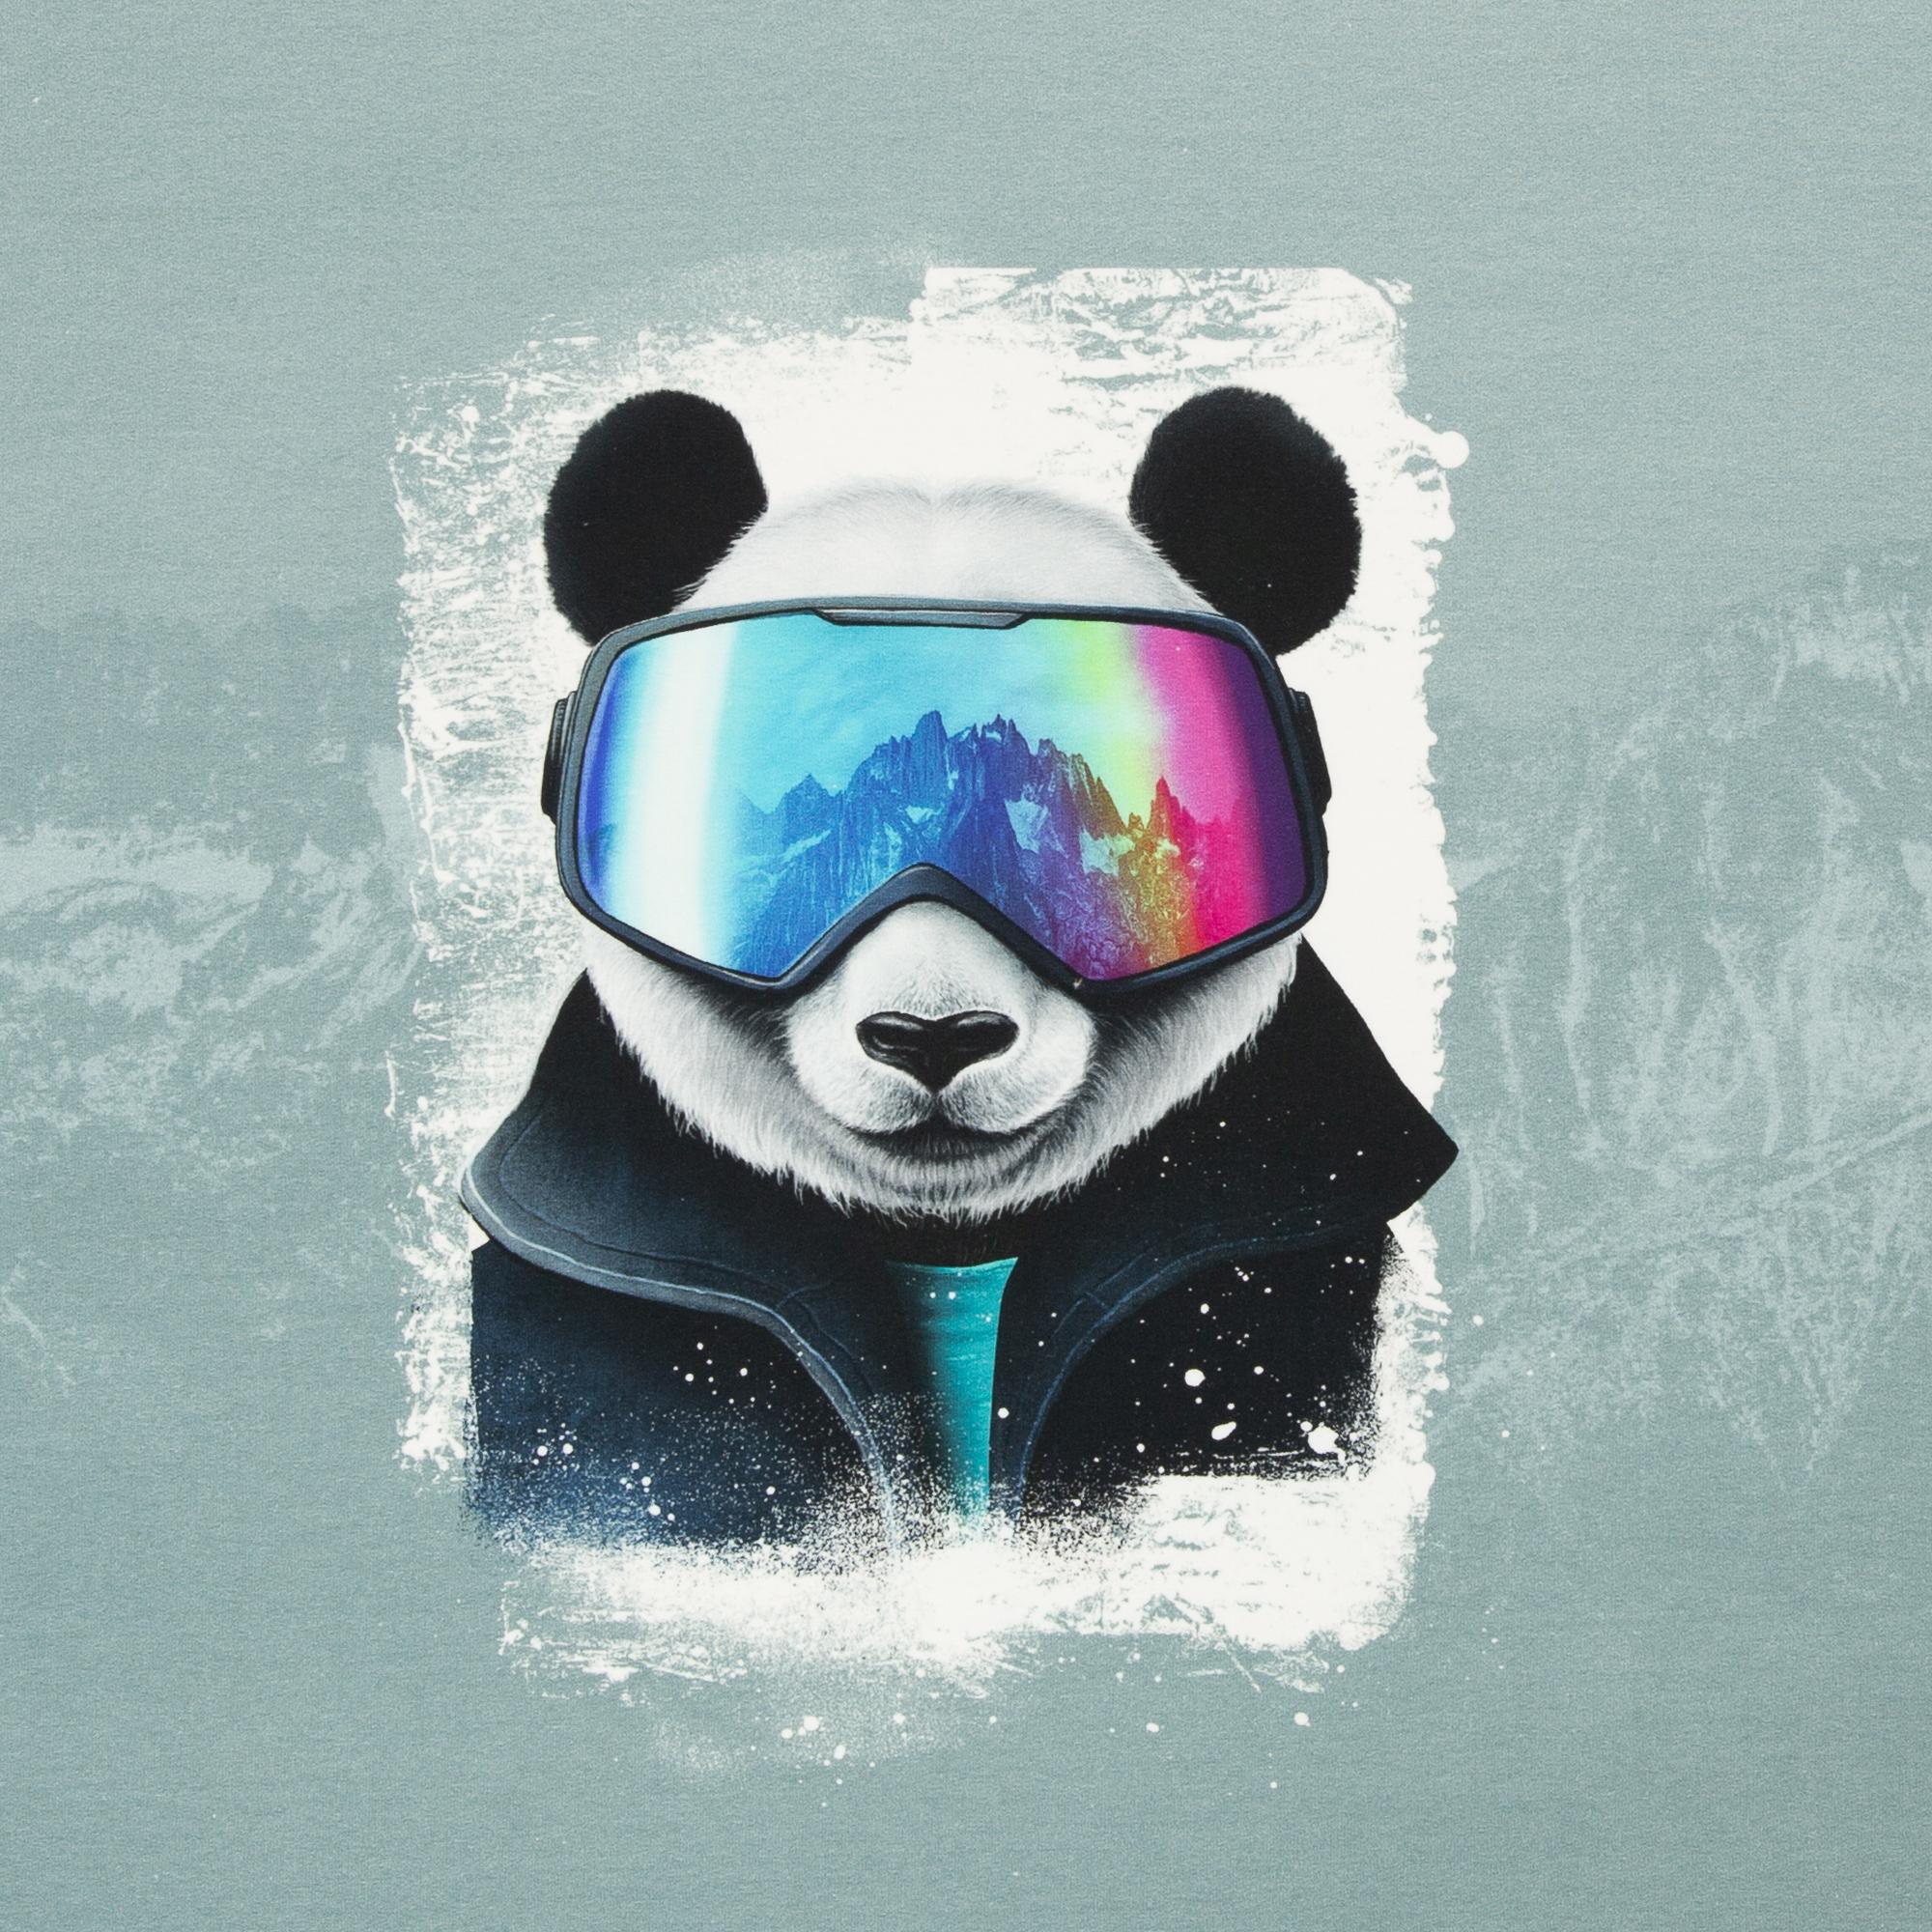 Thorsten Berger Panel - Snow Panda by Thorsten Berger - 80cm x 155cm